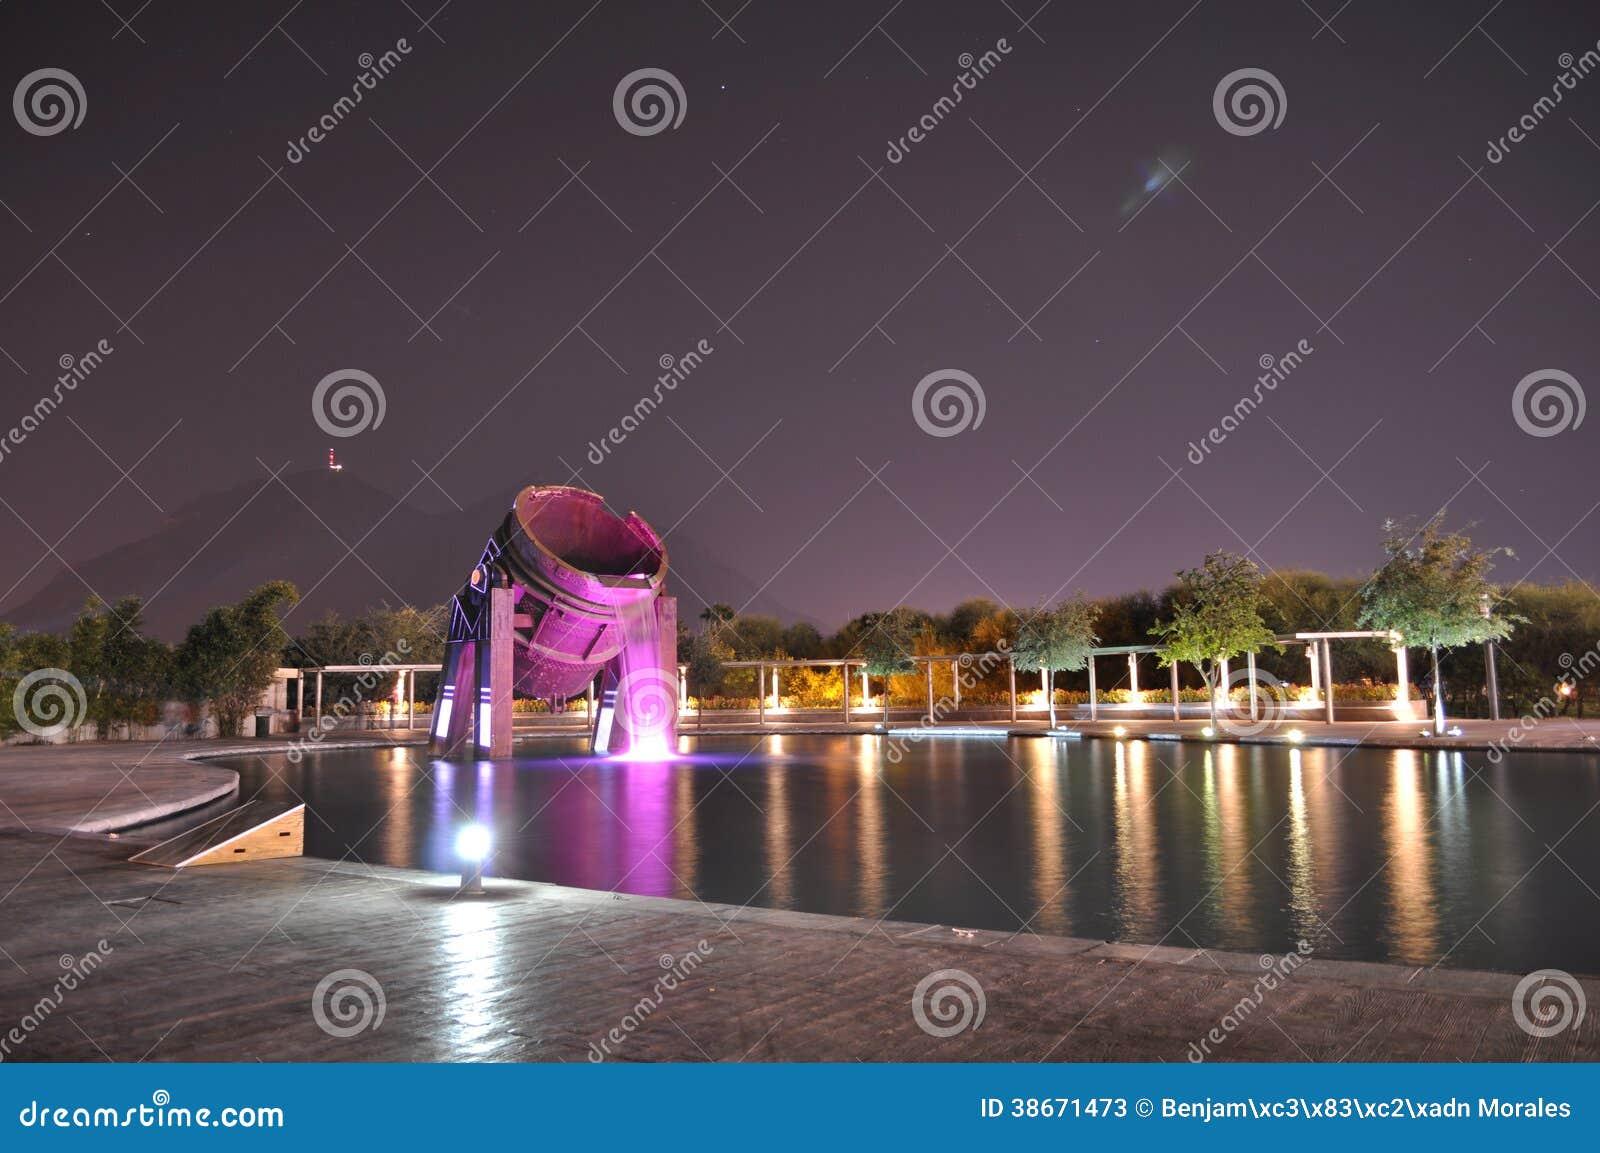 Fundidora parka bębenu zabytku fontanna